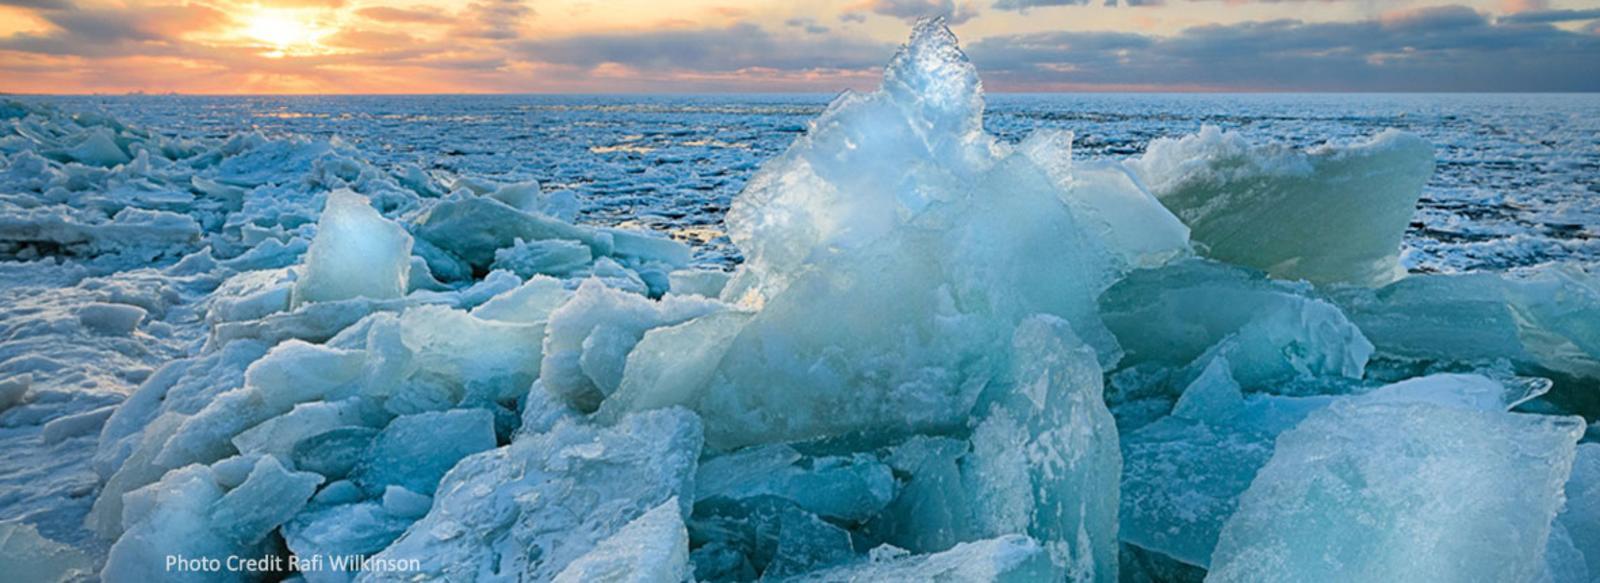 Shelf Ice Indiana Dunes - Rafi Wilkinson